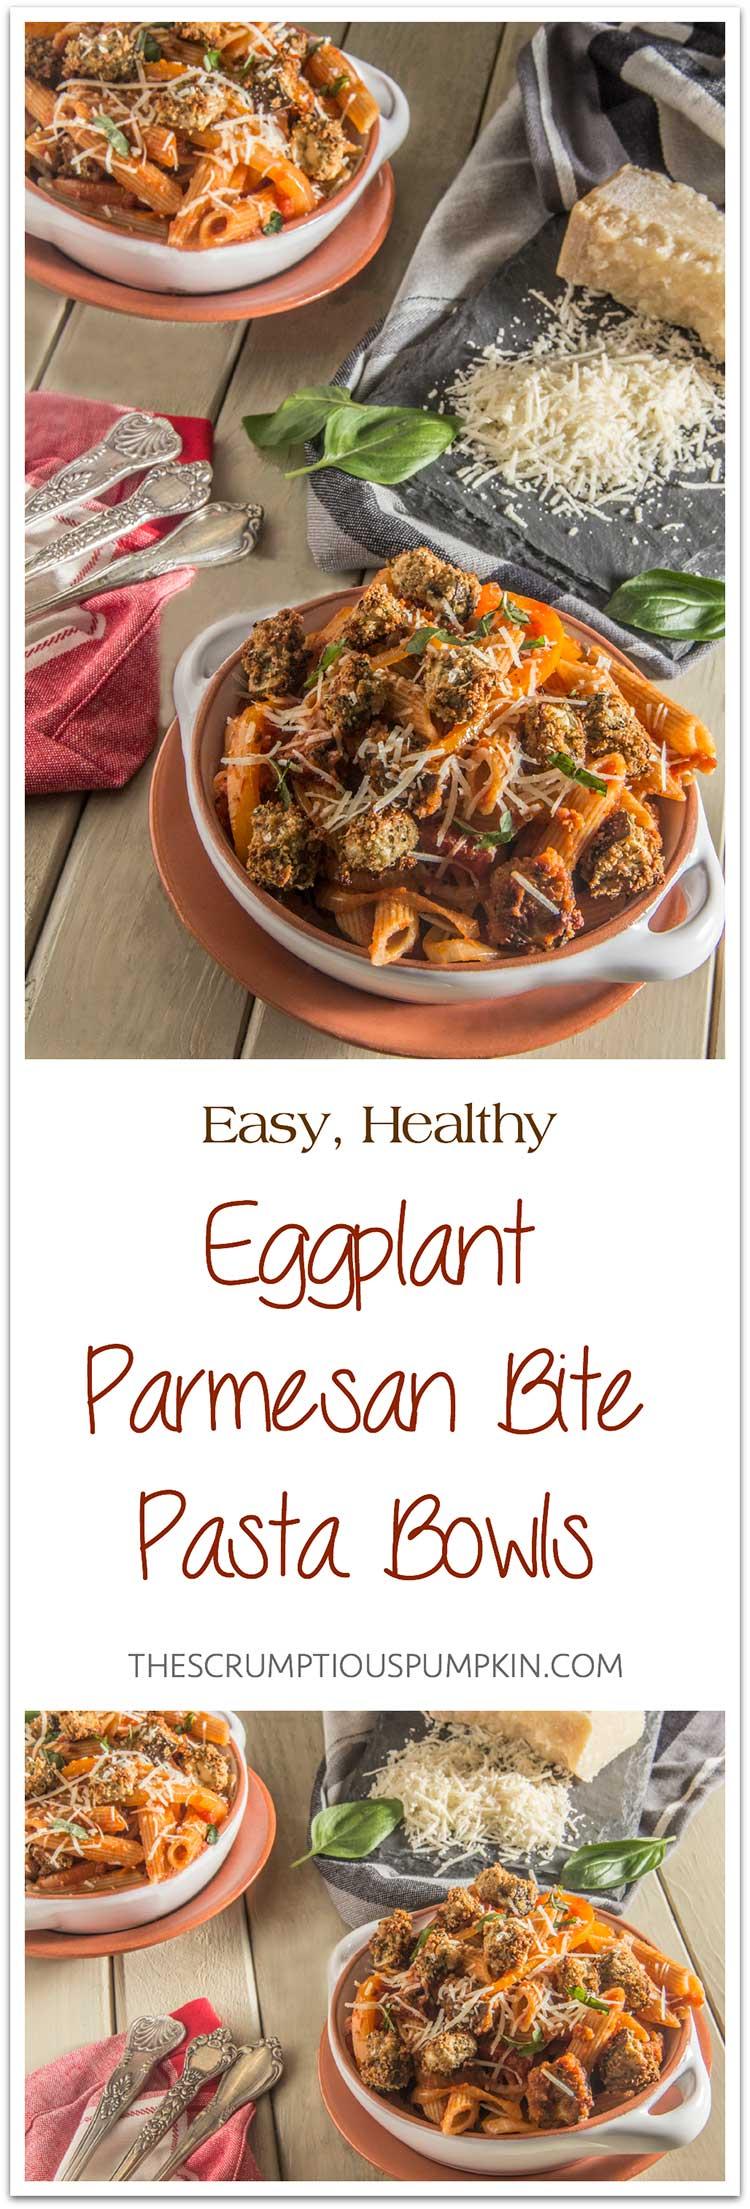 Easy-Healthy-Eggplant-Parmesan-Bite-Pasta-Bowls